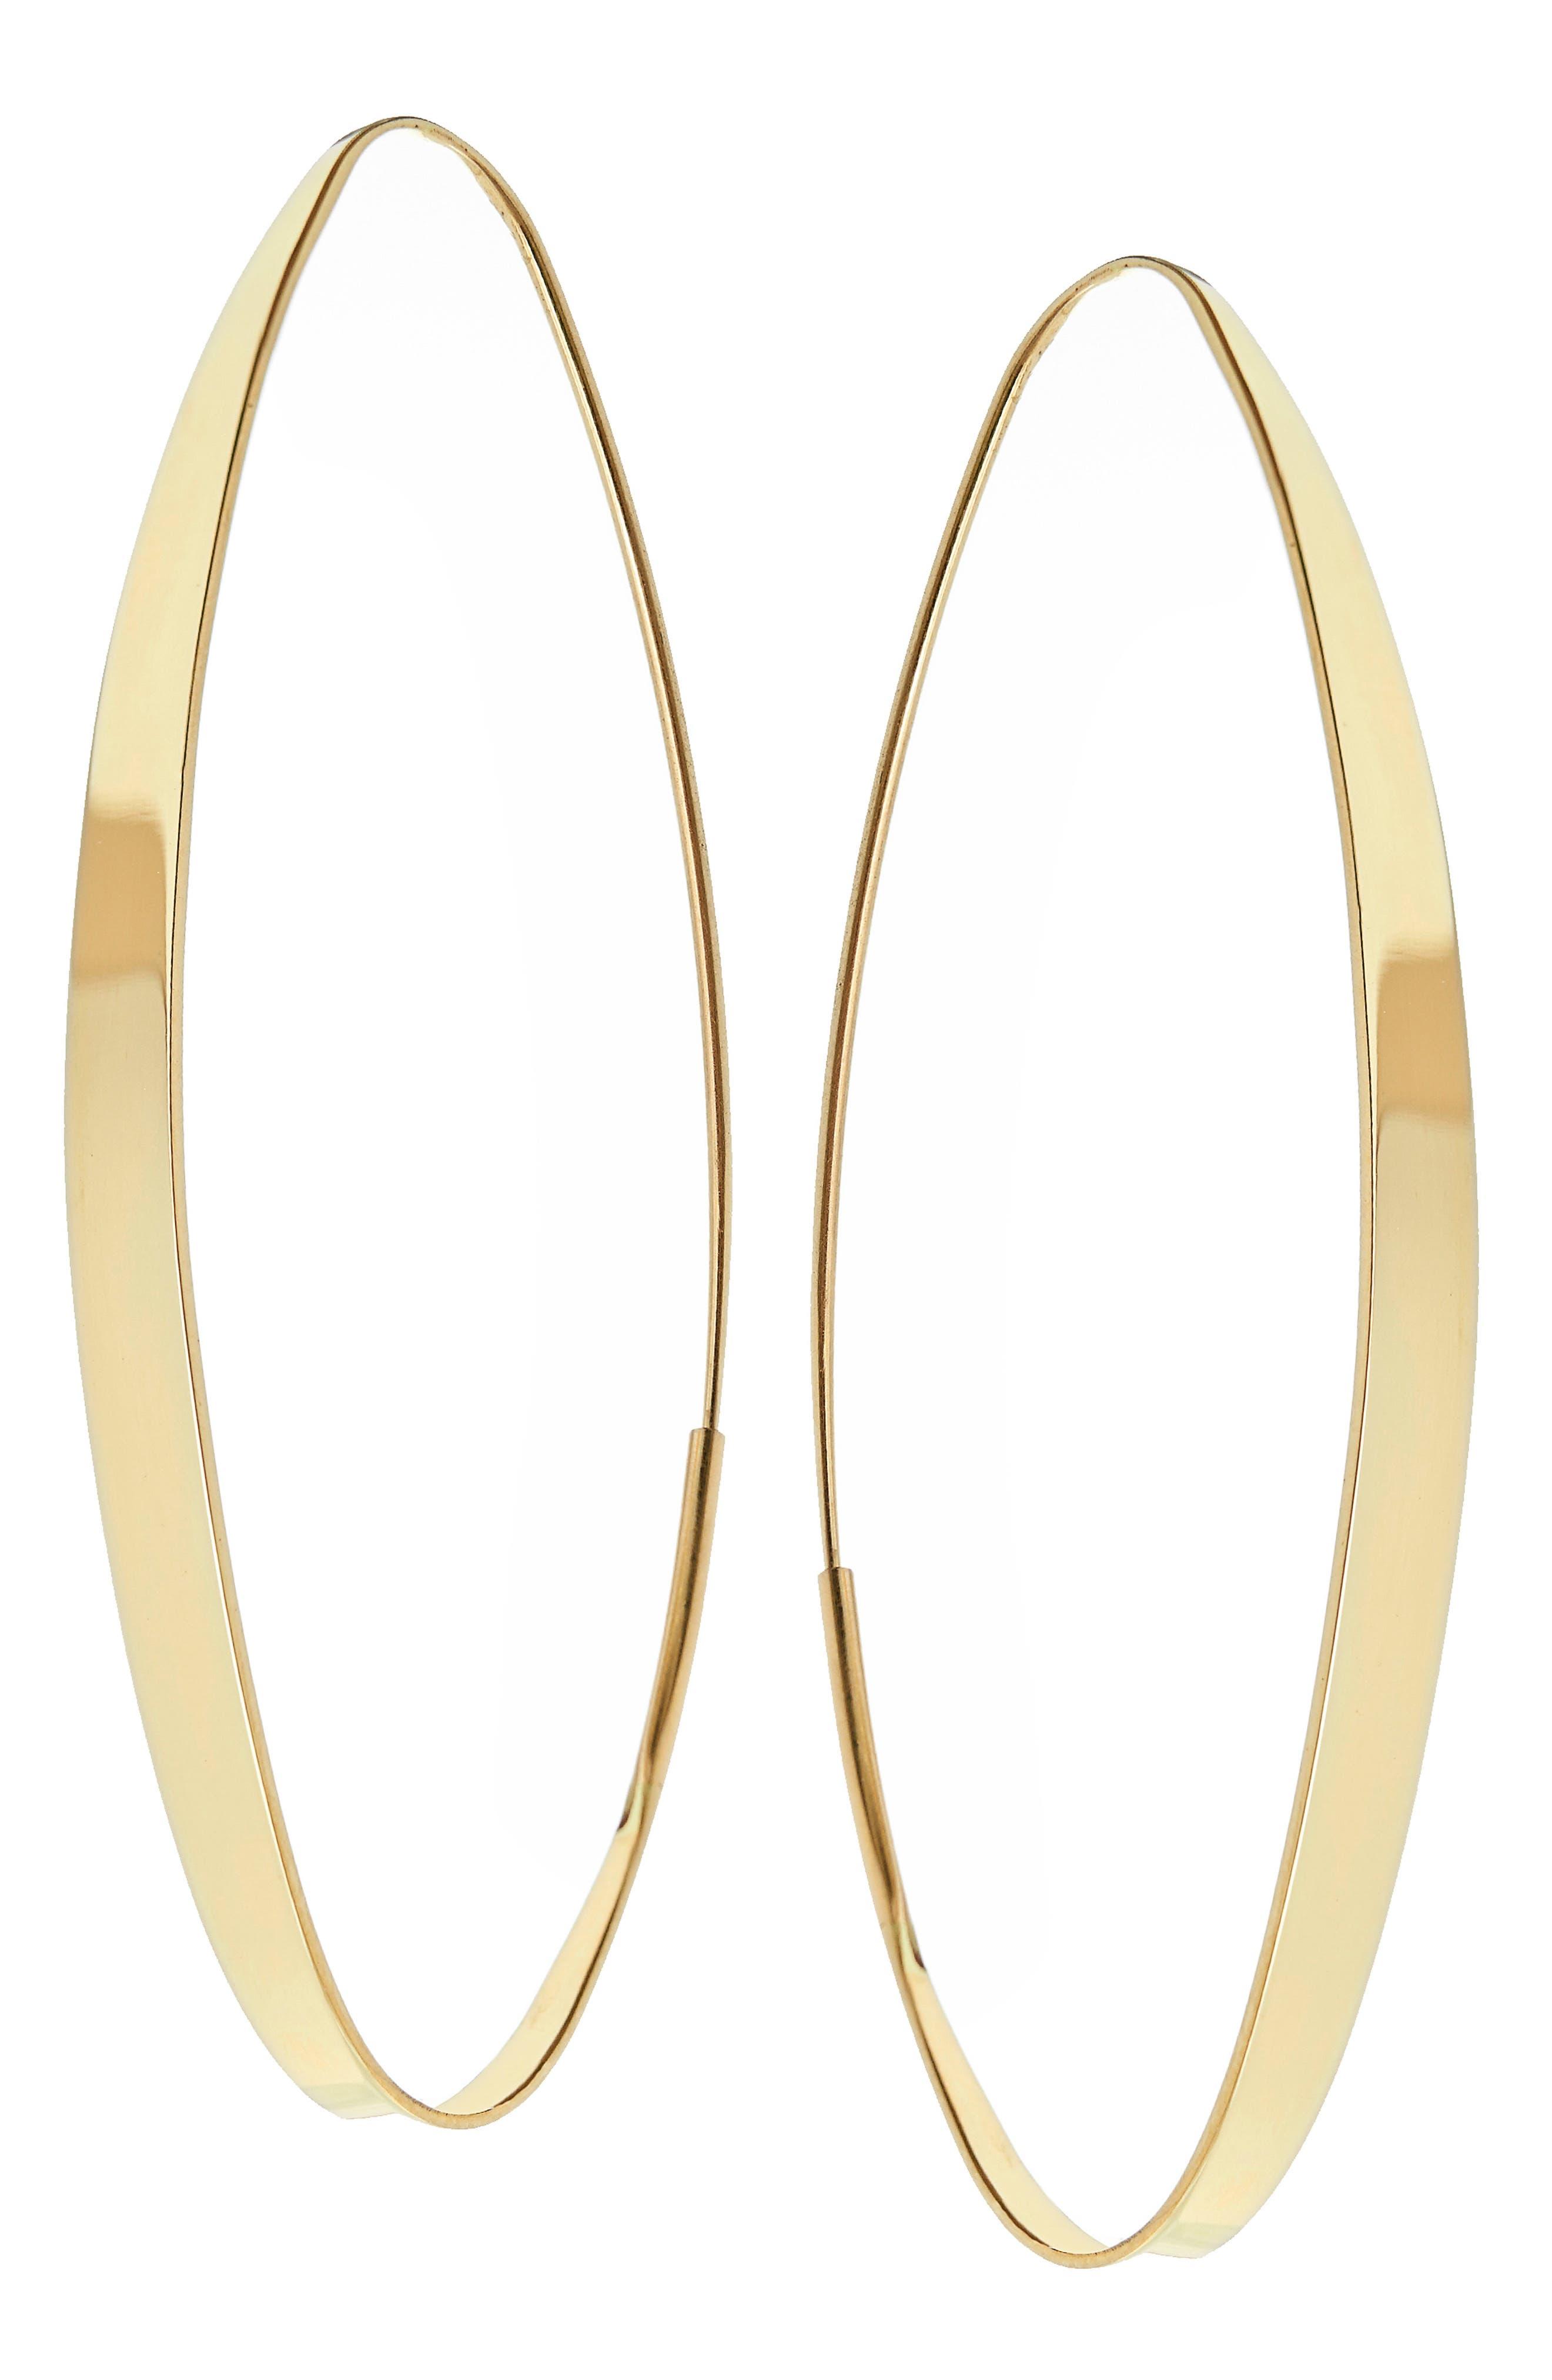 Main Image - Lana Jewelry Large Narrow Gloss Magic Hoops